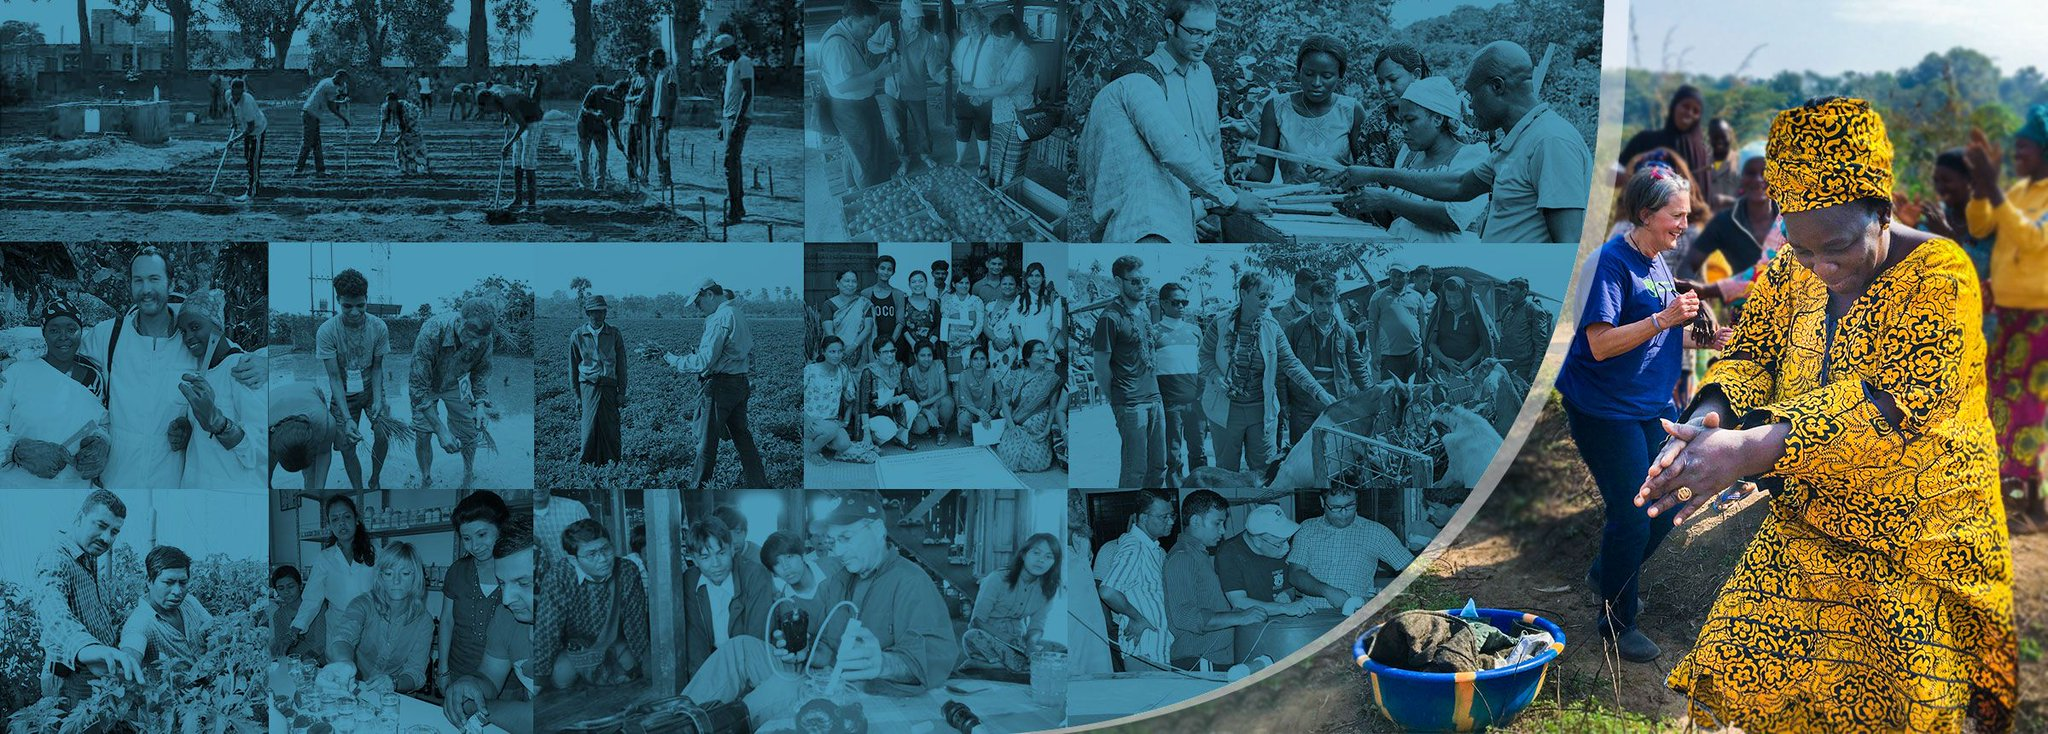 .@farmertofarmer promotes sustainable agricultural development worldwide #NVW #Volunteer #Agriculture #SDGs https://t.co/wKcza2zr5M https://t.co/2CB6lqpr5W